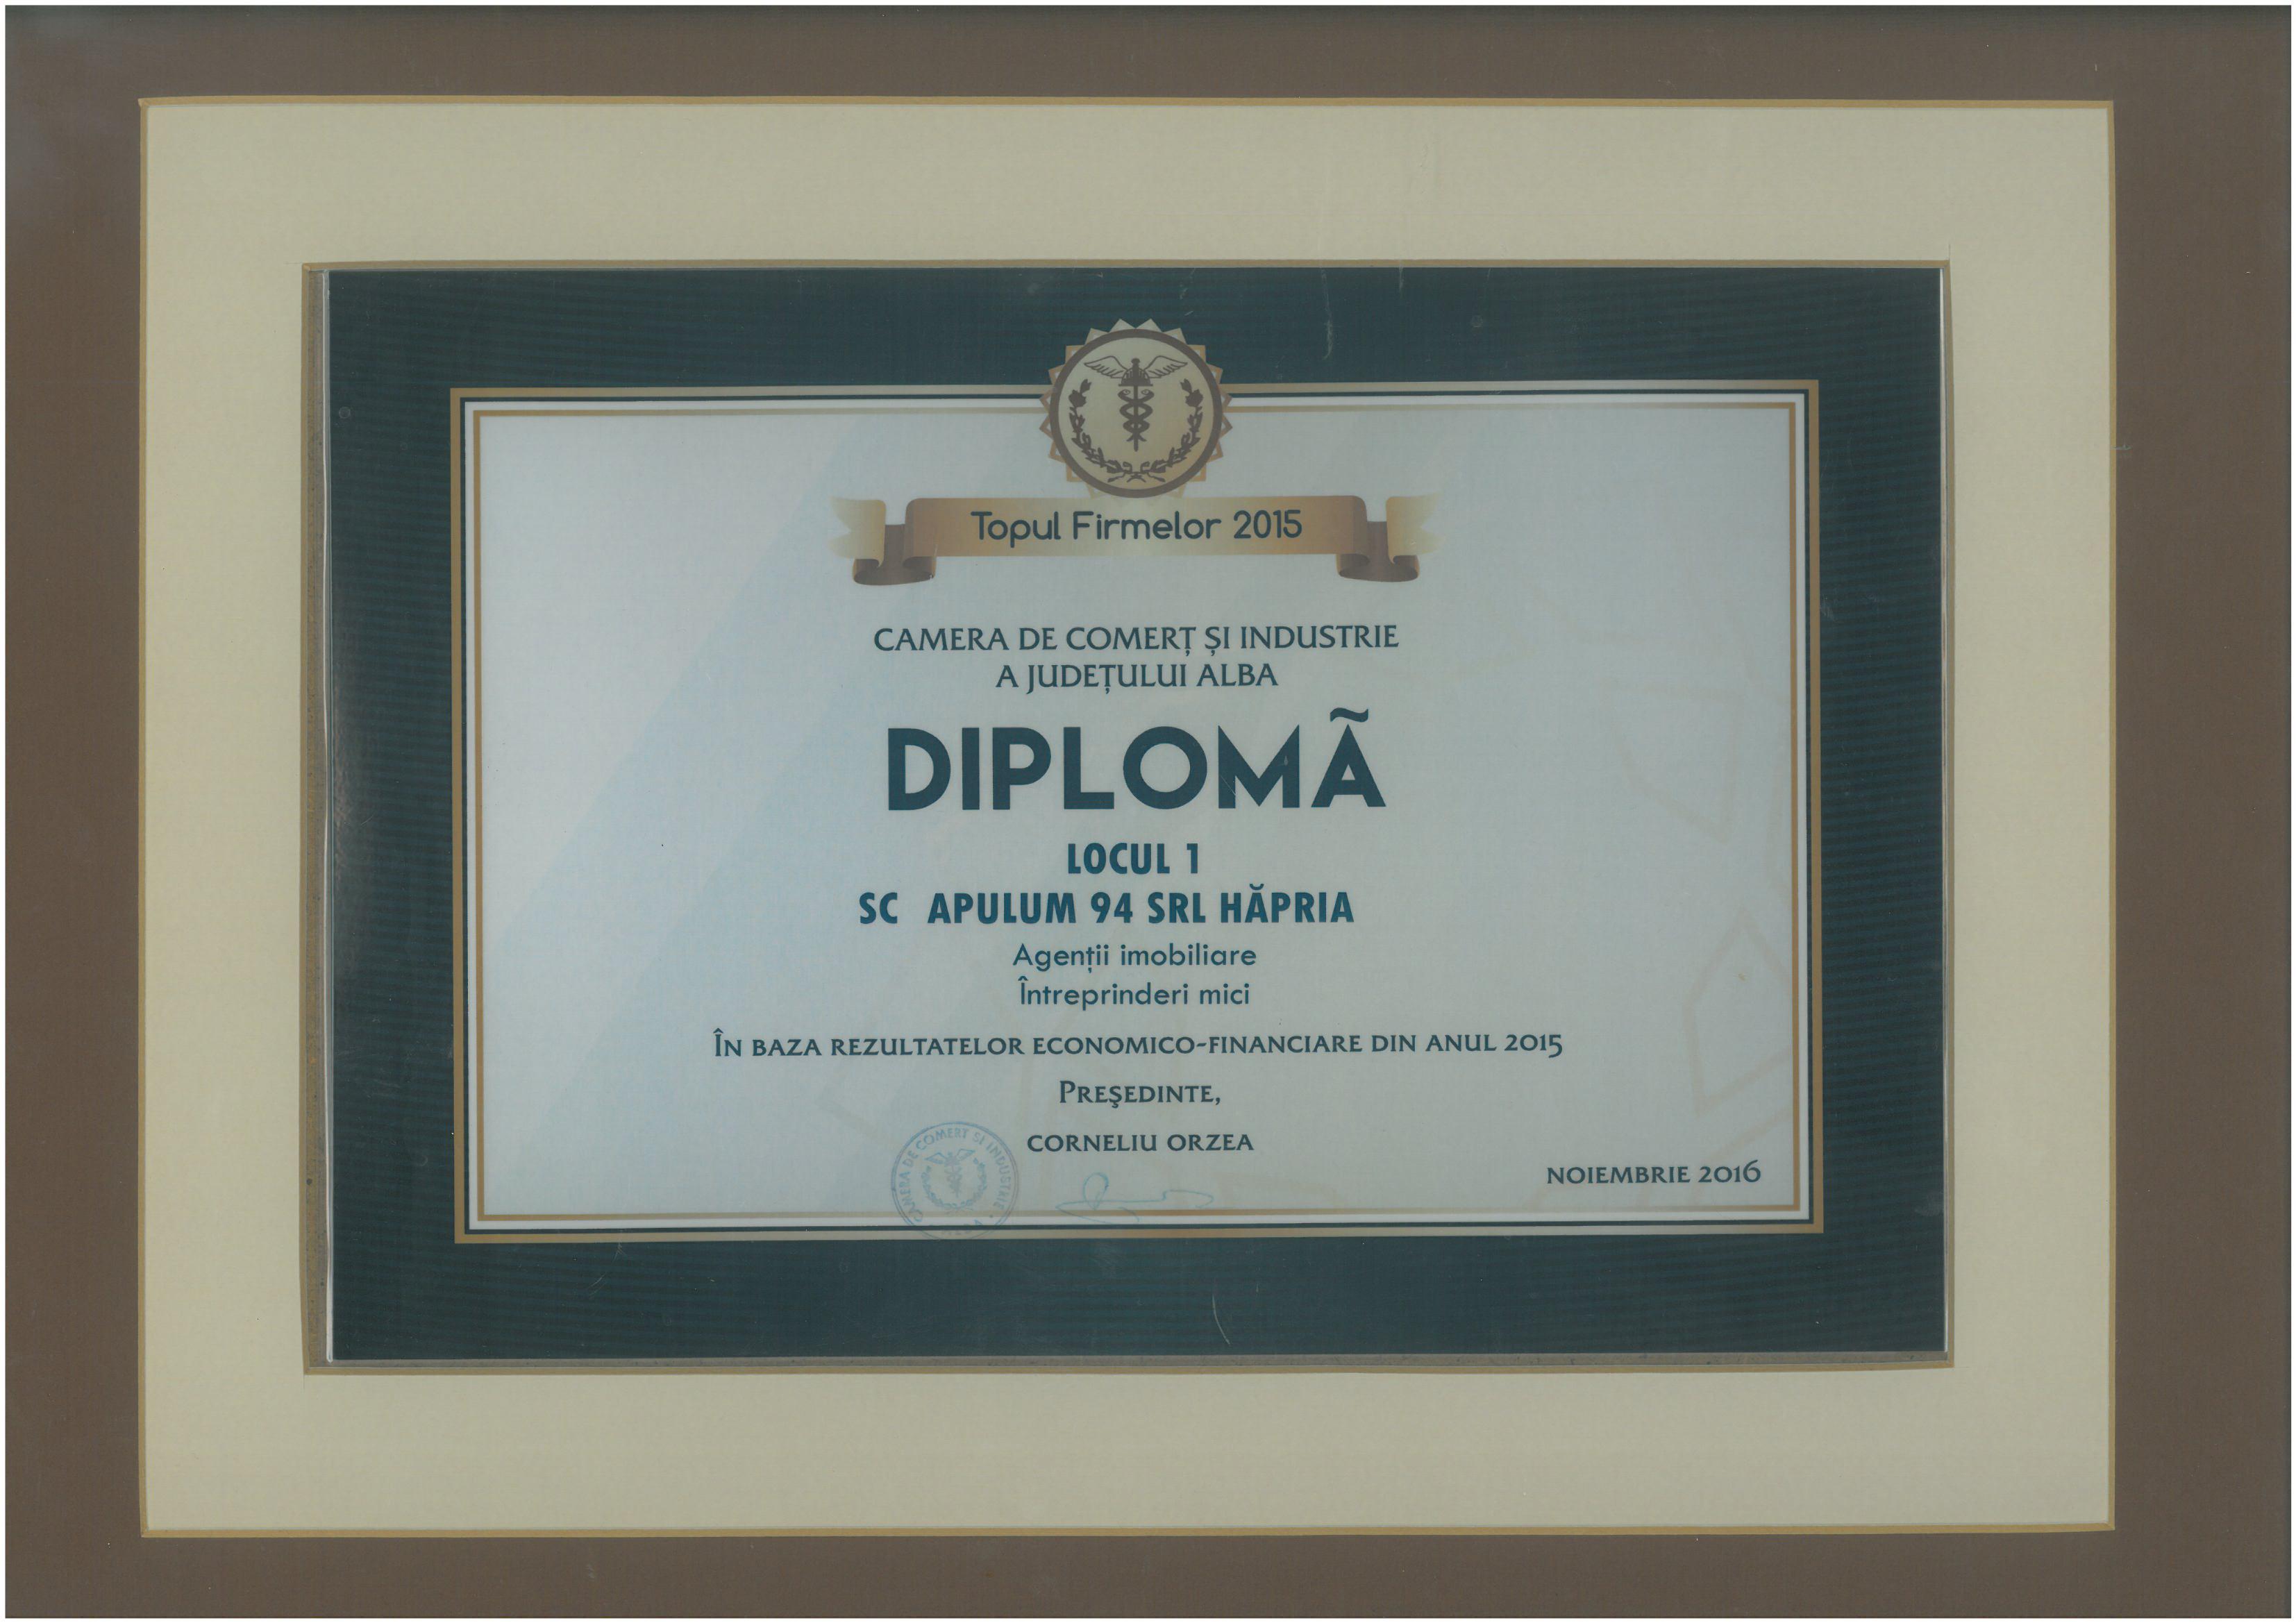 Camera de Comert si Industrie Alba – 2016 - Diploma Locul 1